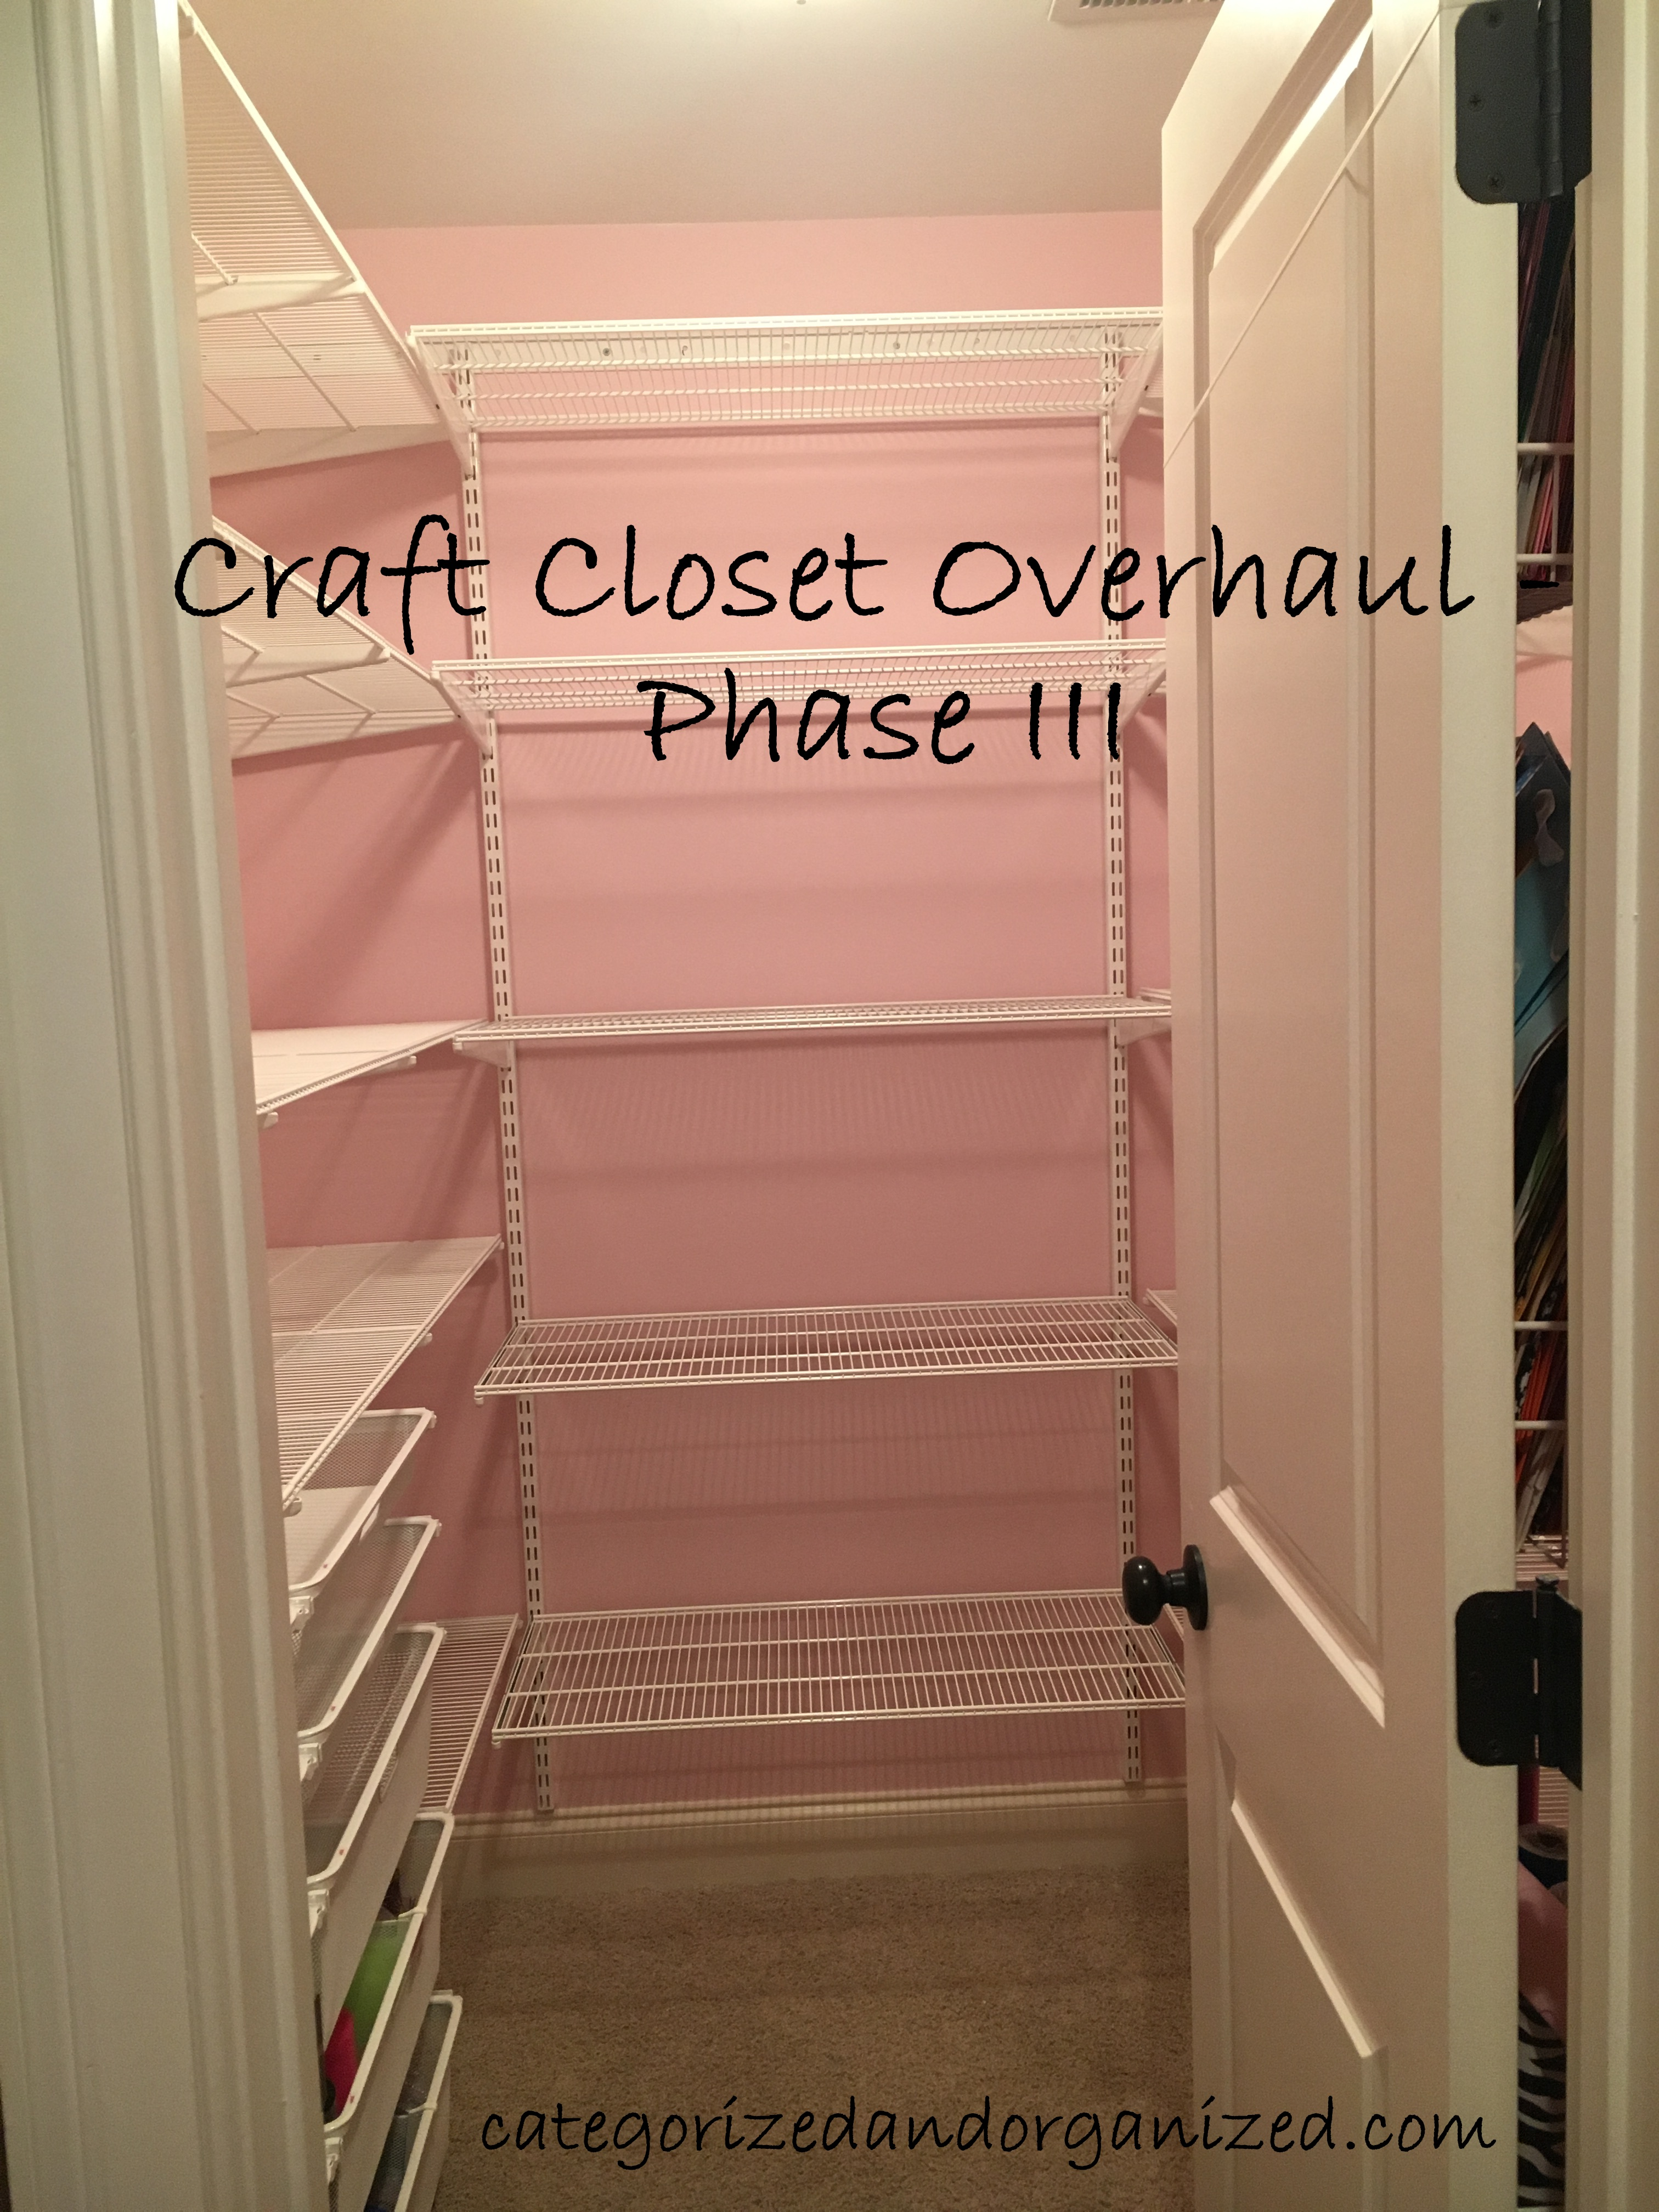 Craft Room Closet Overhaul Phase Iii Categorized And